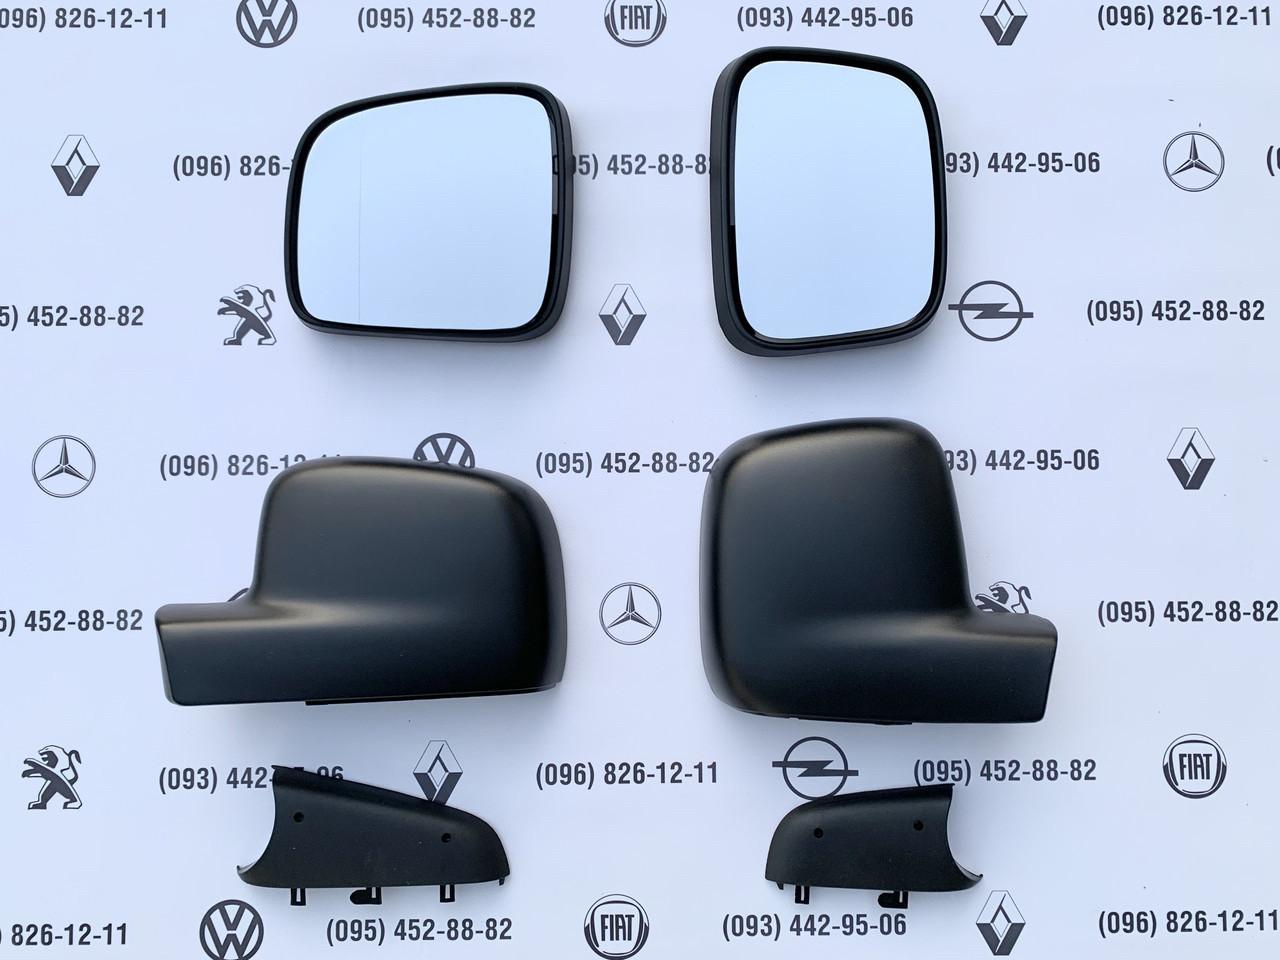 Корпус зеркала, накладка, ободок, крышка, низок, вкладыш зеркала VW T5 T6, Caddy Фольксваген Т5 Т6, Кедди